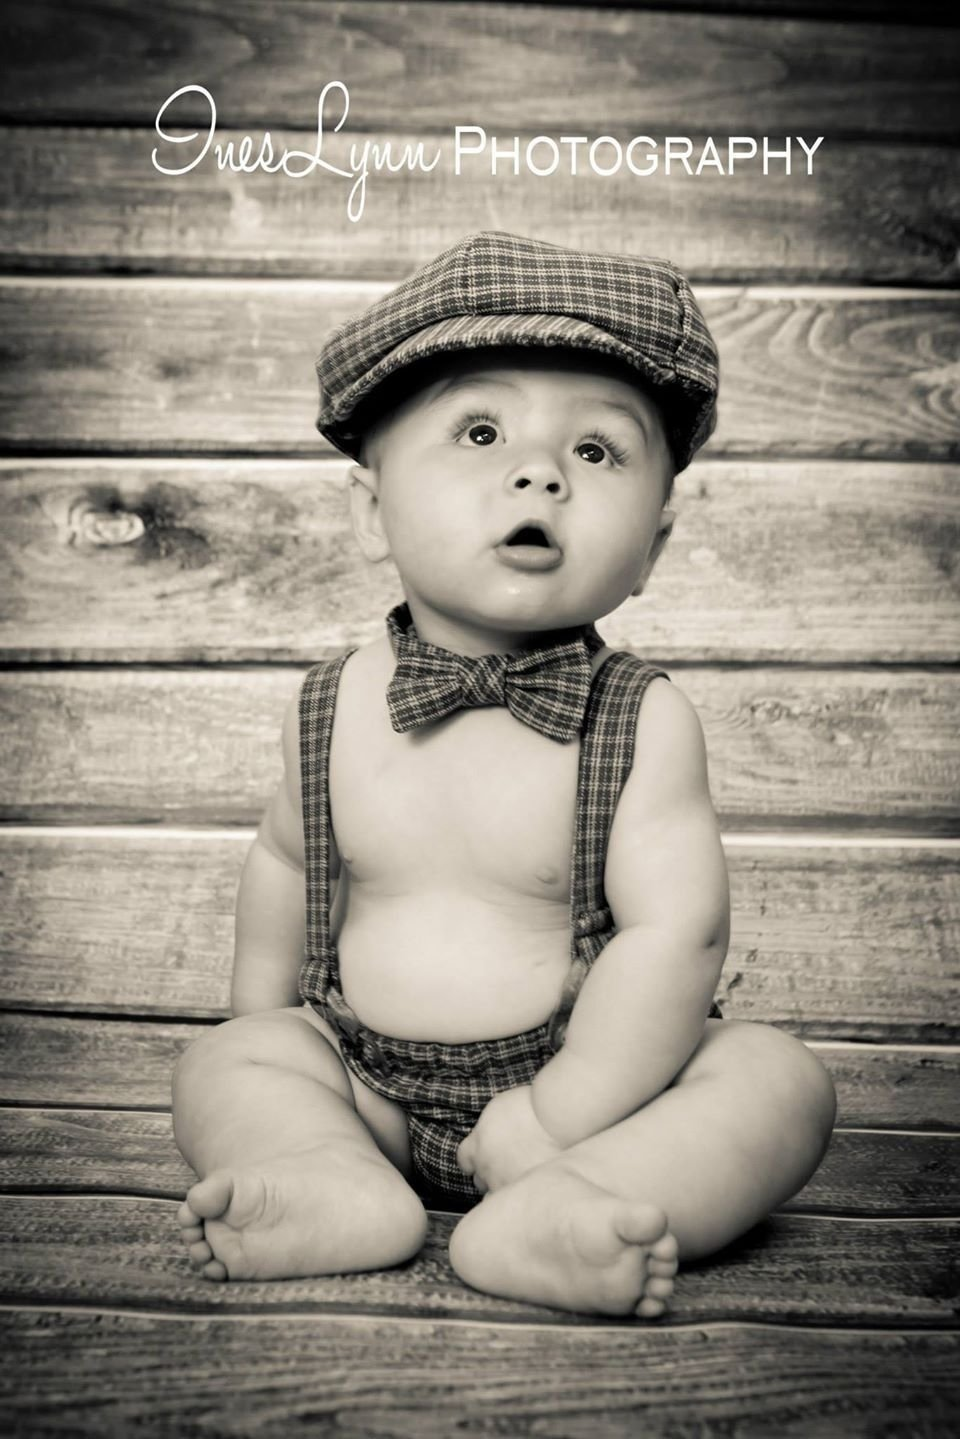 10 Wonderful 6 Month Baby Boy Photo Ideas 6 month old baby photography ideas baby boy photo ideas vintage 1 2020